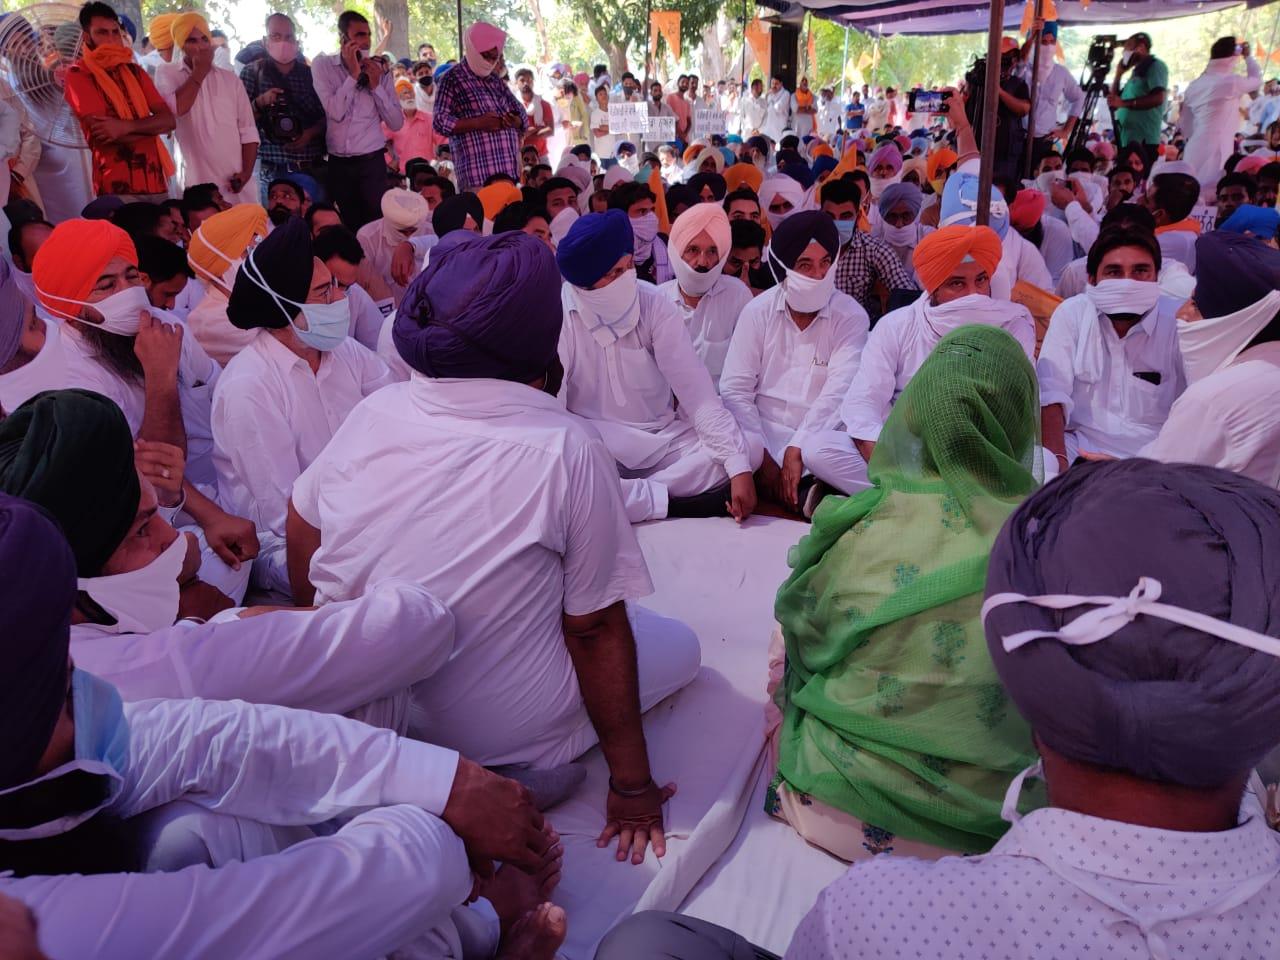 Rashtriya Kisan Manch says farm Bills will benefit farmers, opposes bandh call